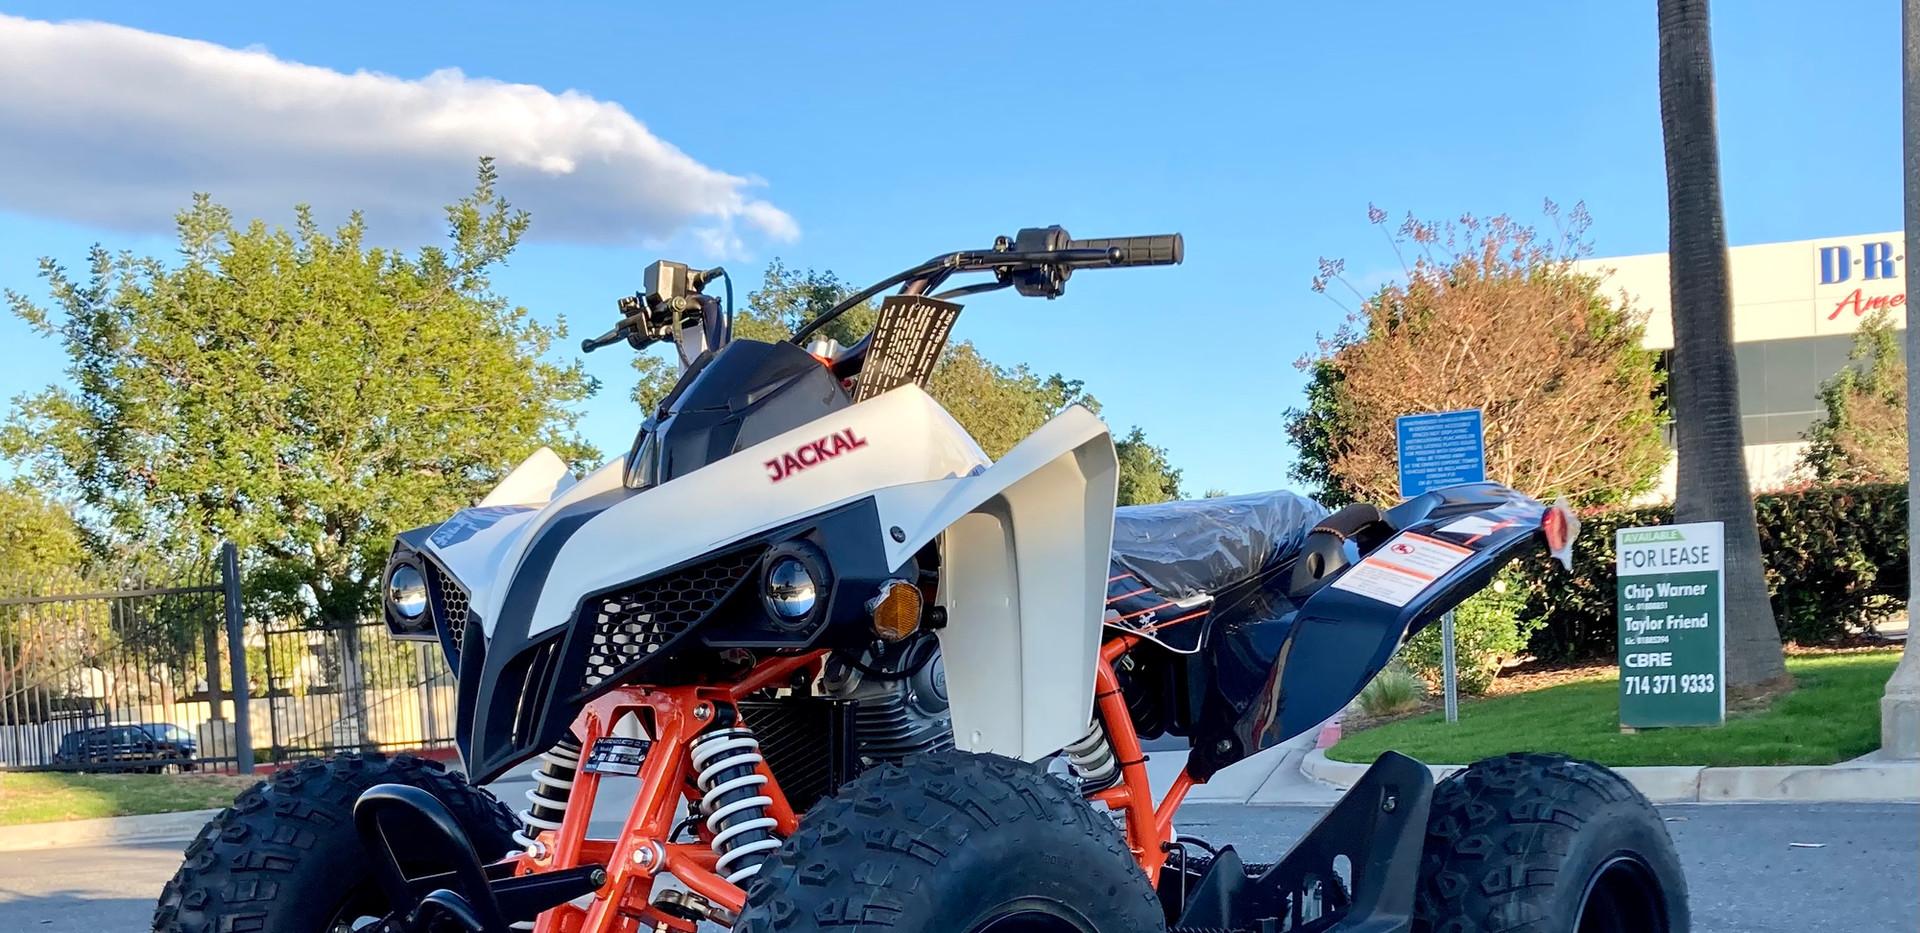 2021 Kayo Jackal 200 White